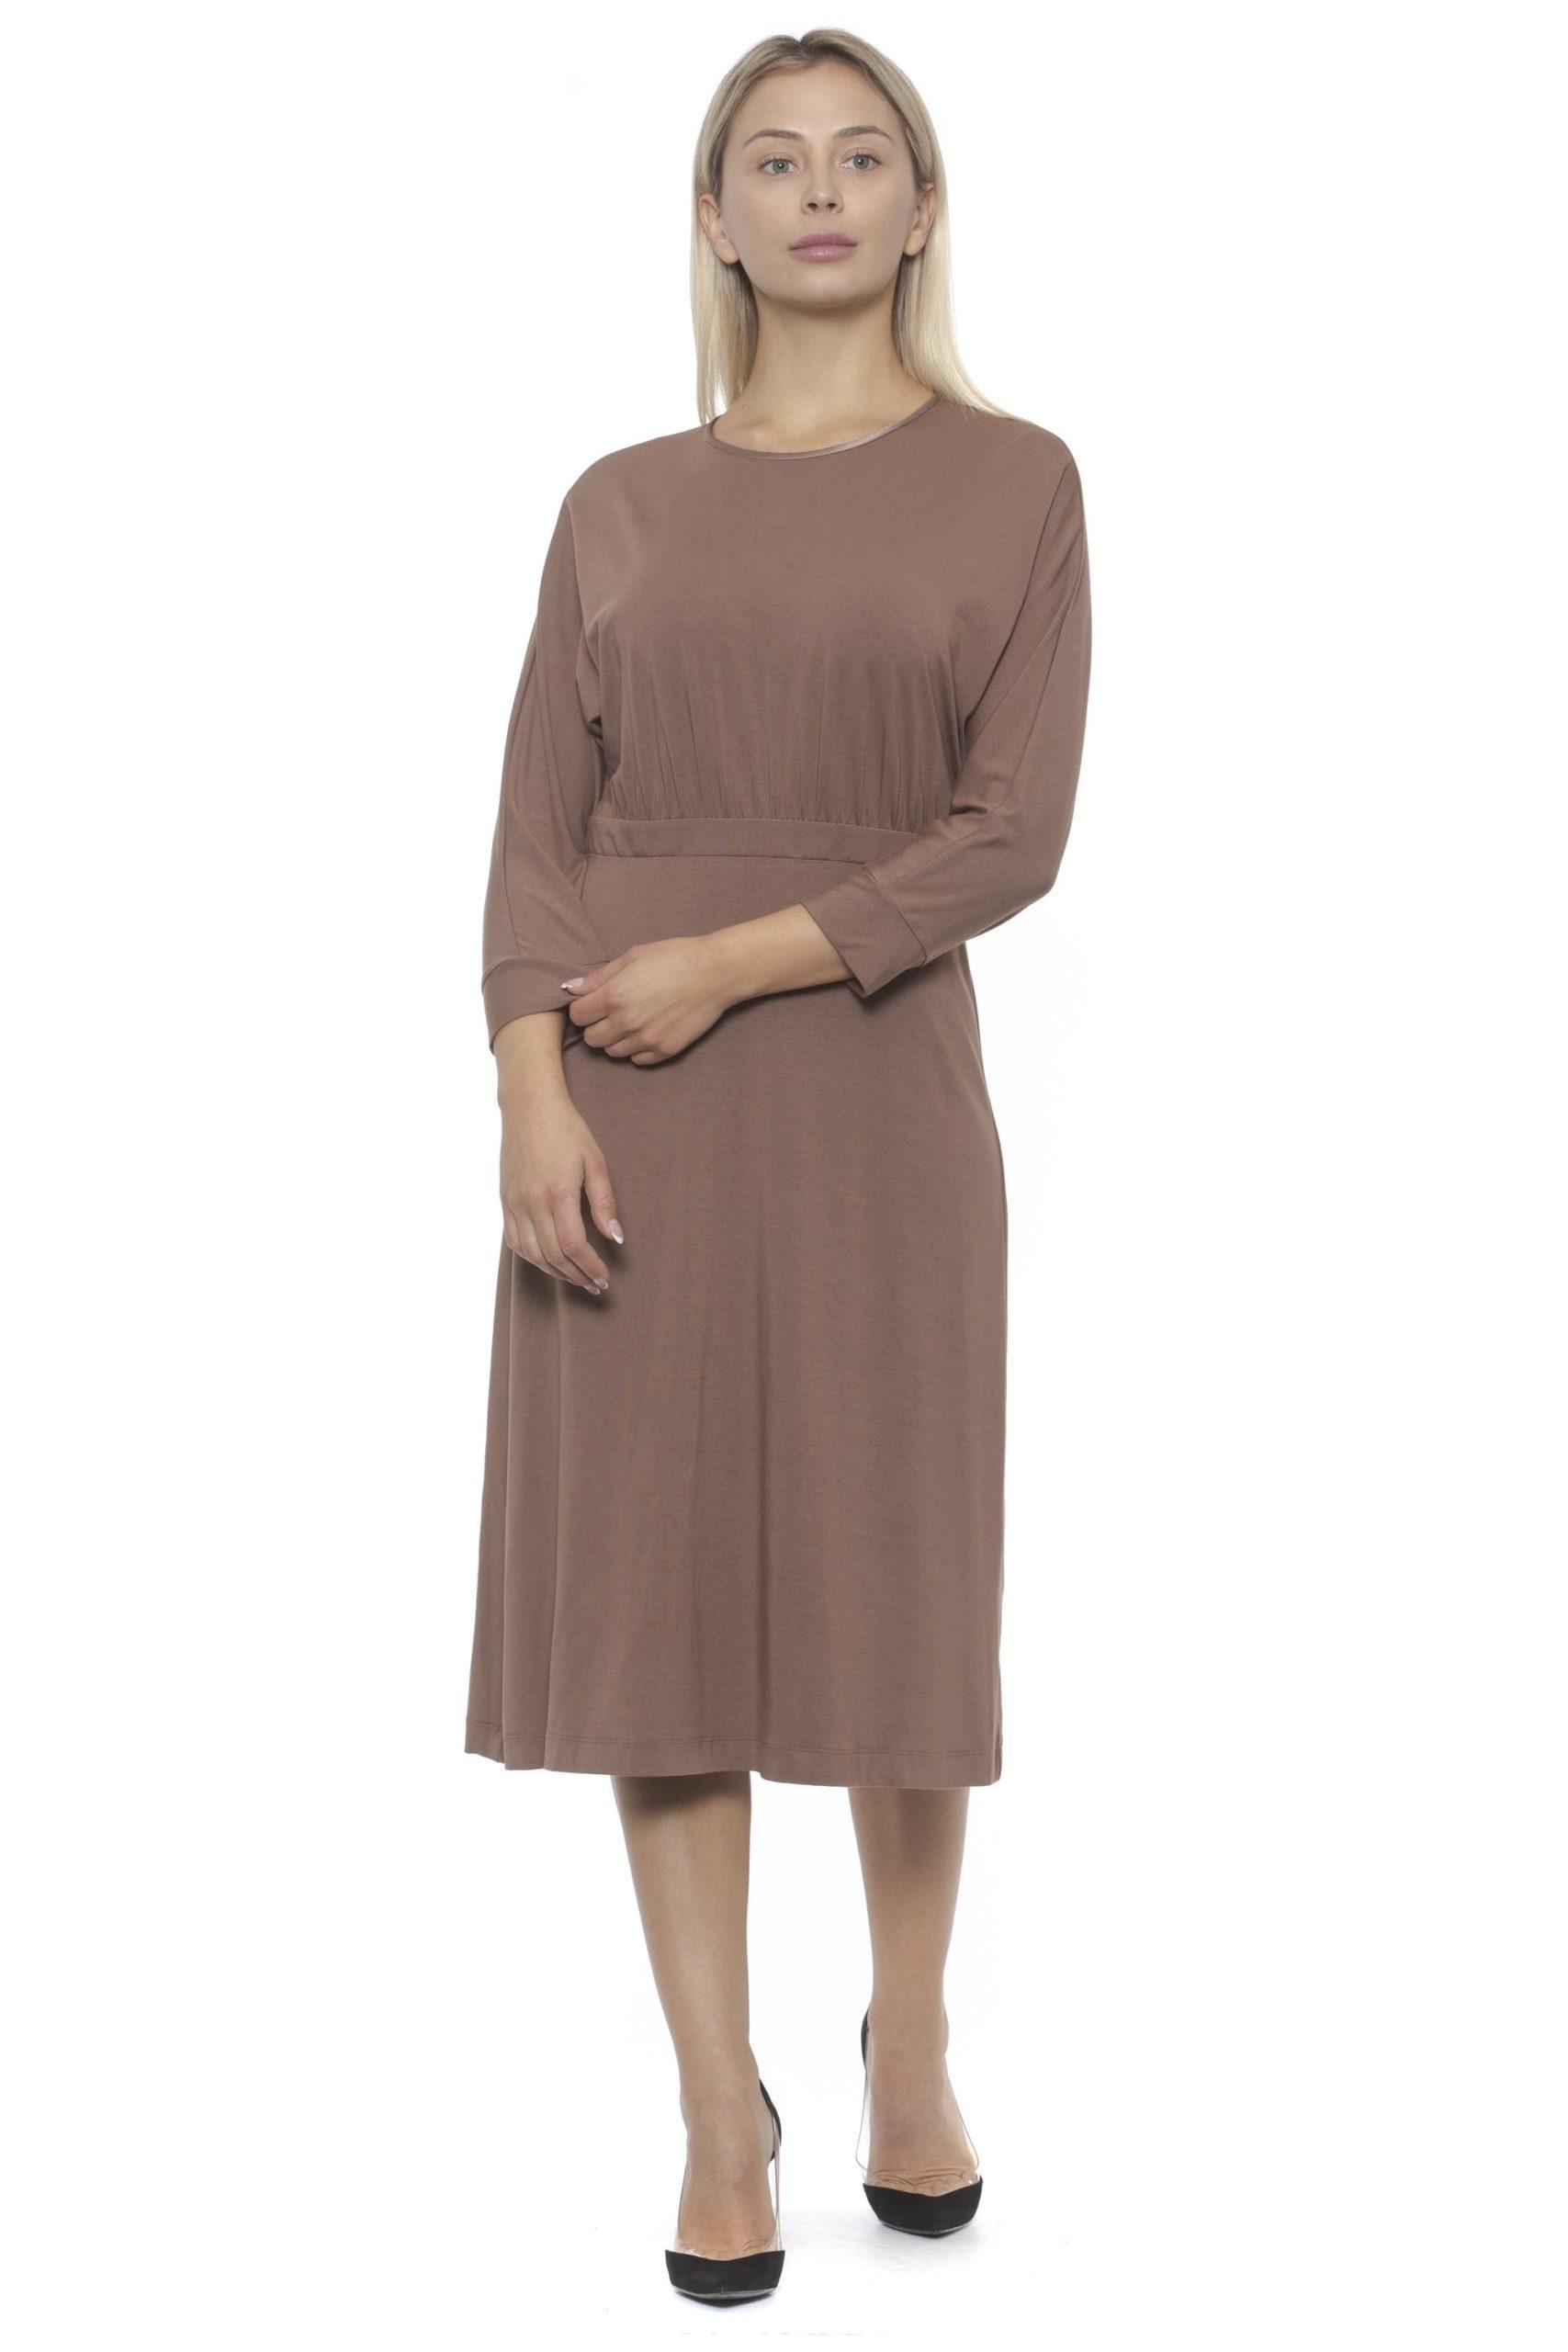 Peserico Women's Brosa Dress Pink PE1383180 - IT42   S